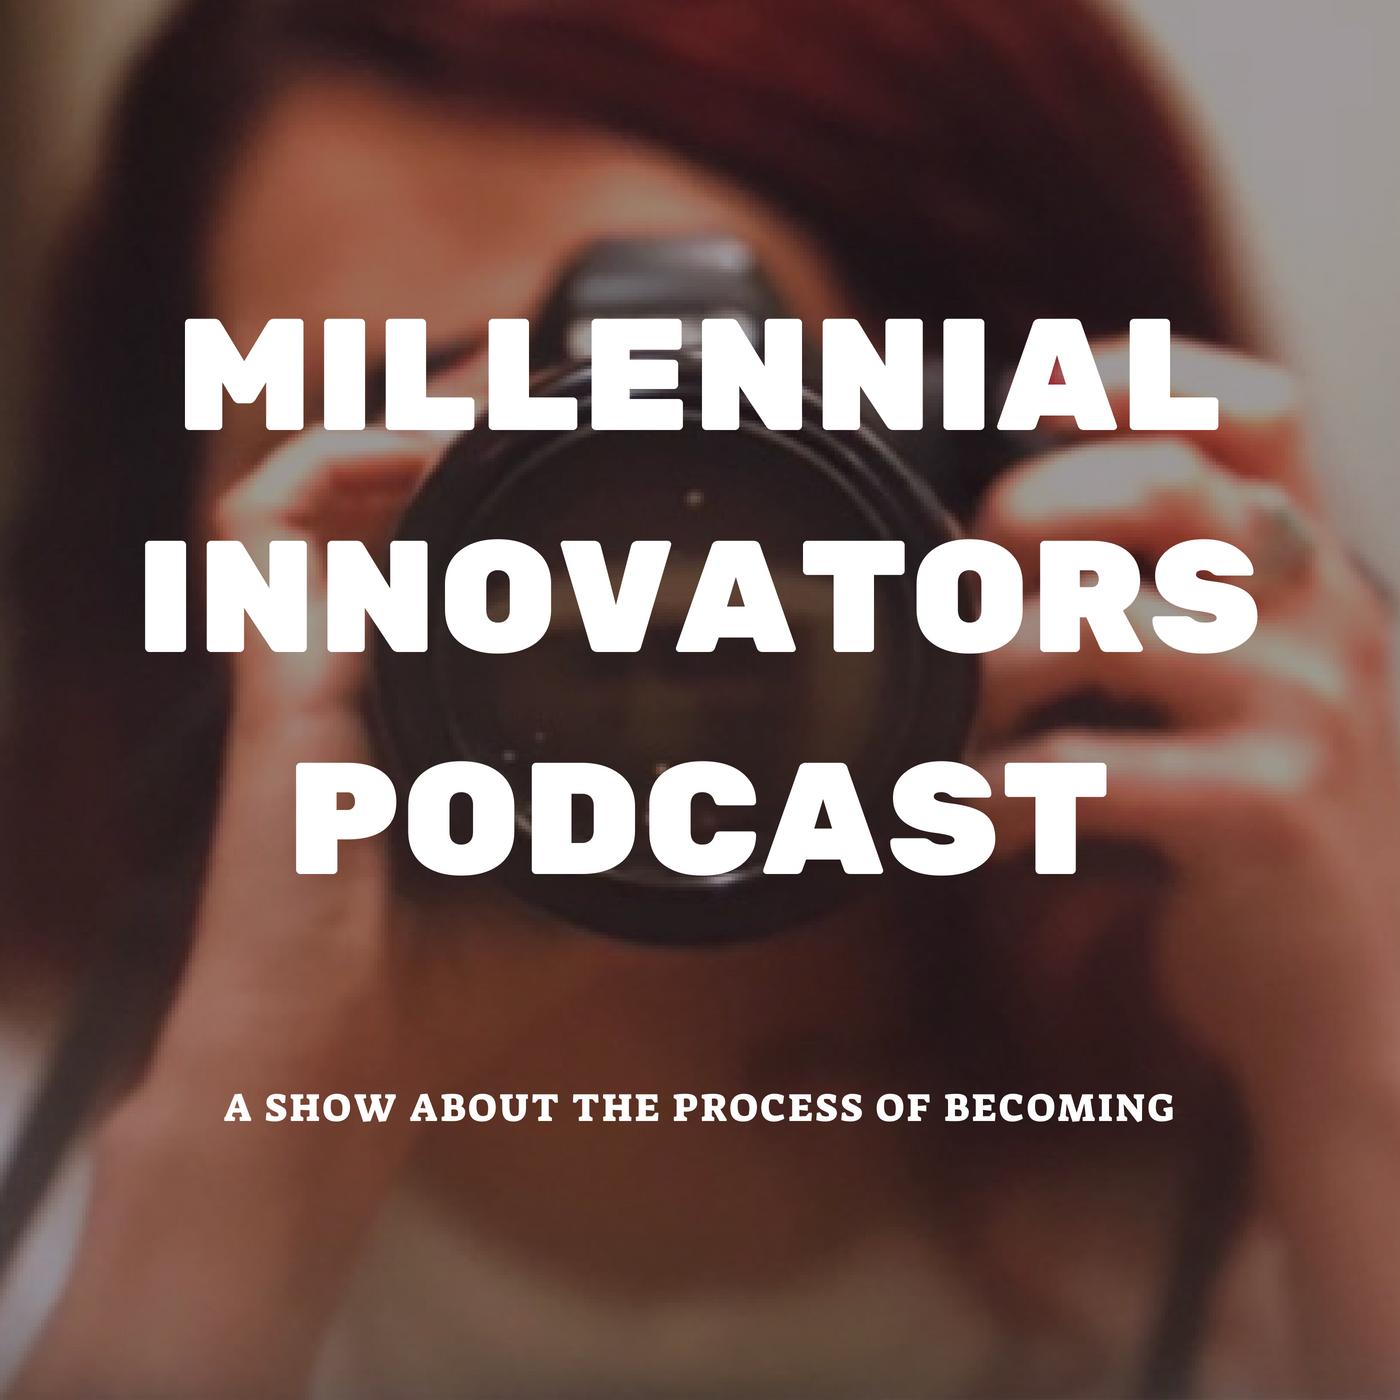 millennial innovators podcast_cover art